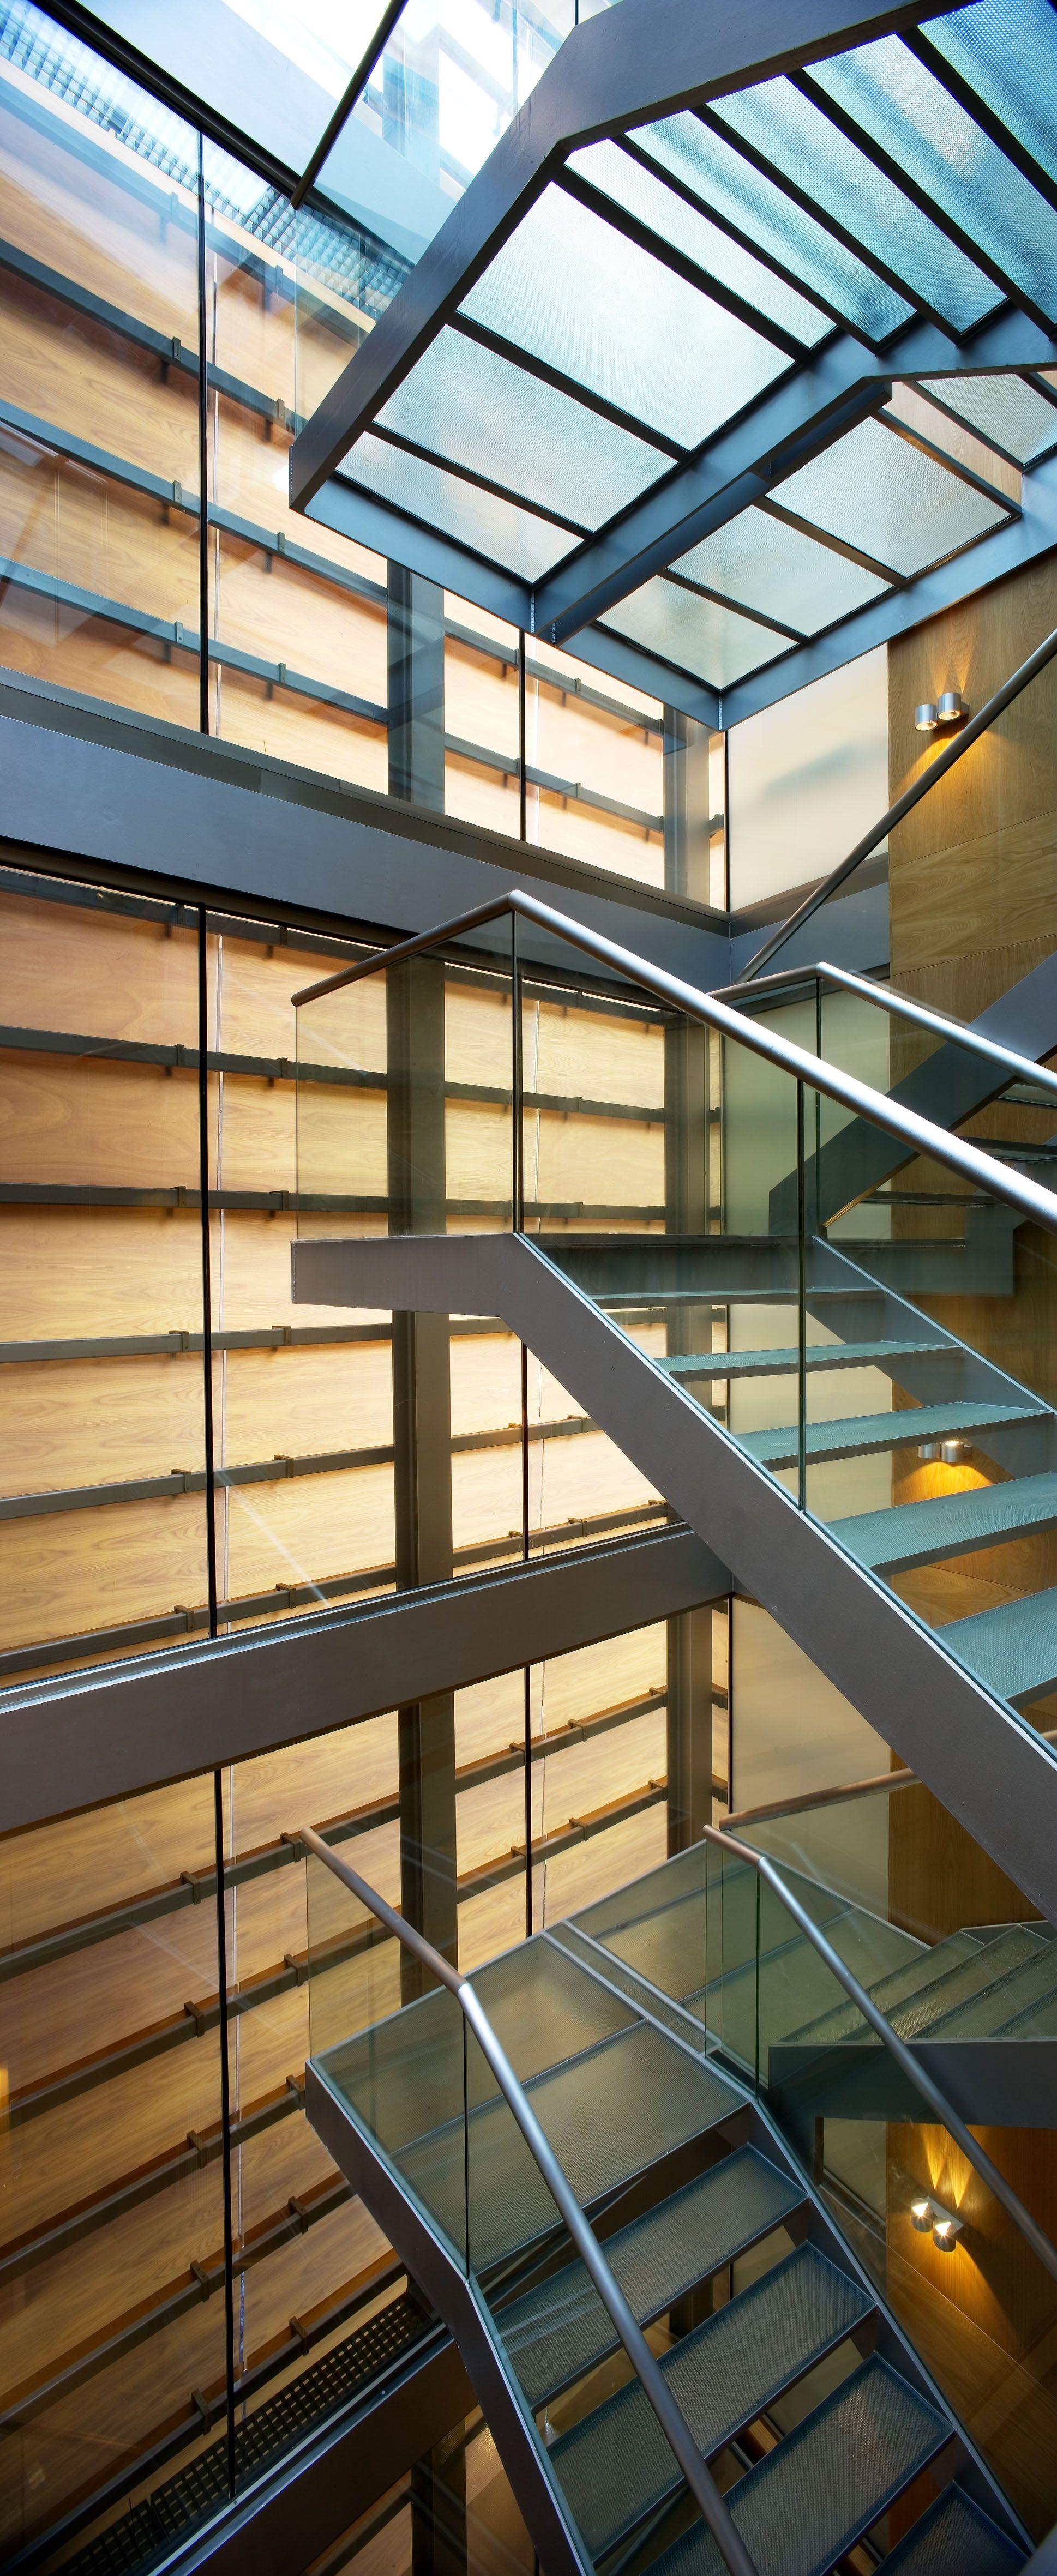 Project colegio de arquitectos gij n architect c sar ruiz - Arquitectos gijon ...